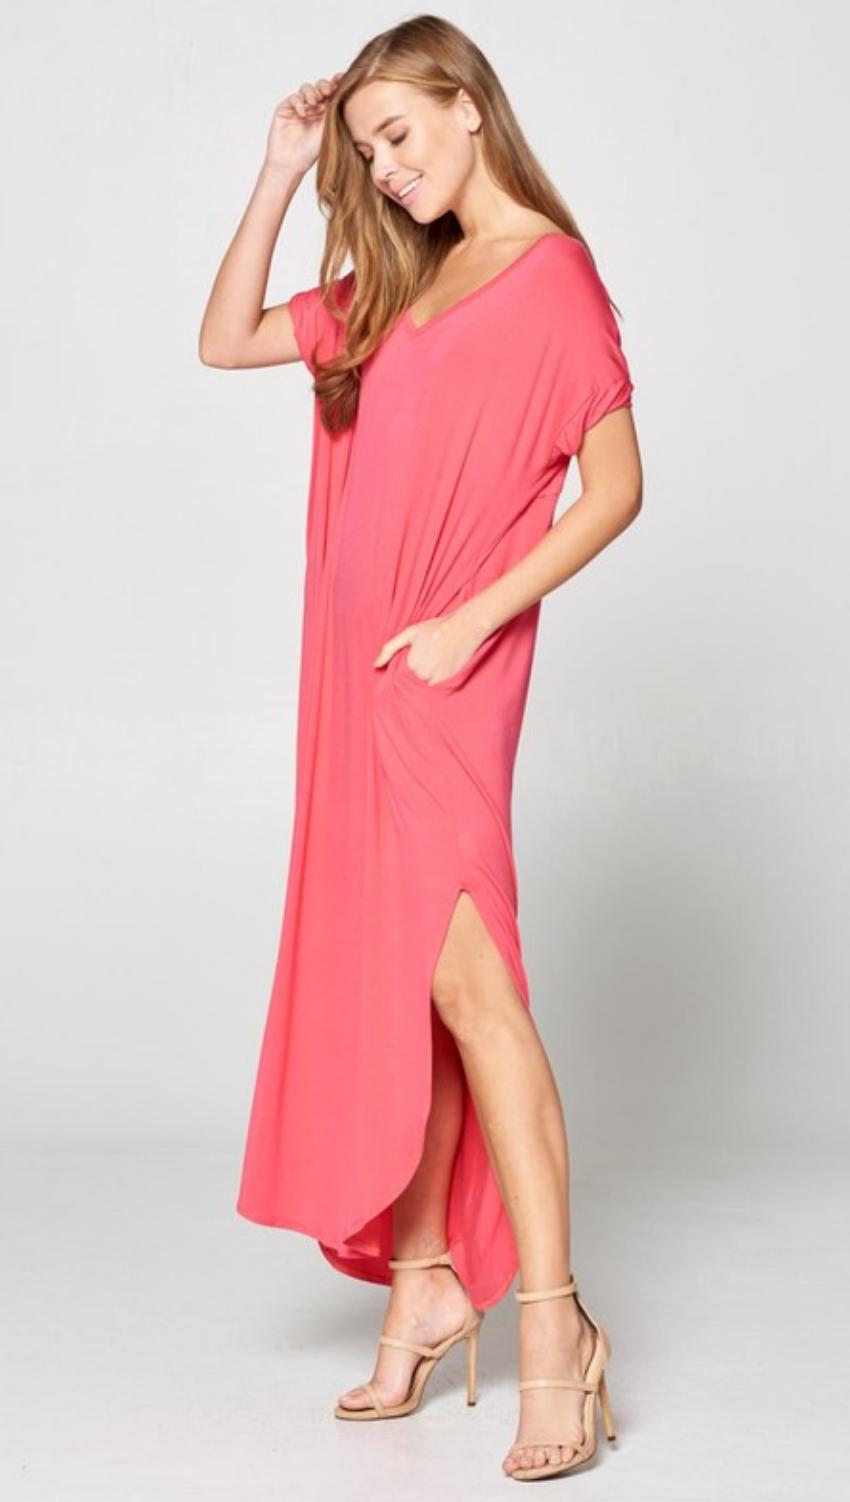 fdeb89462e2 Coral V-Neck Maxi Dress with Pockets - TheBlingBoxOnline.com